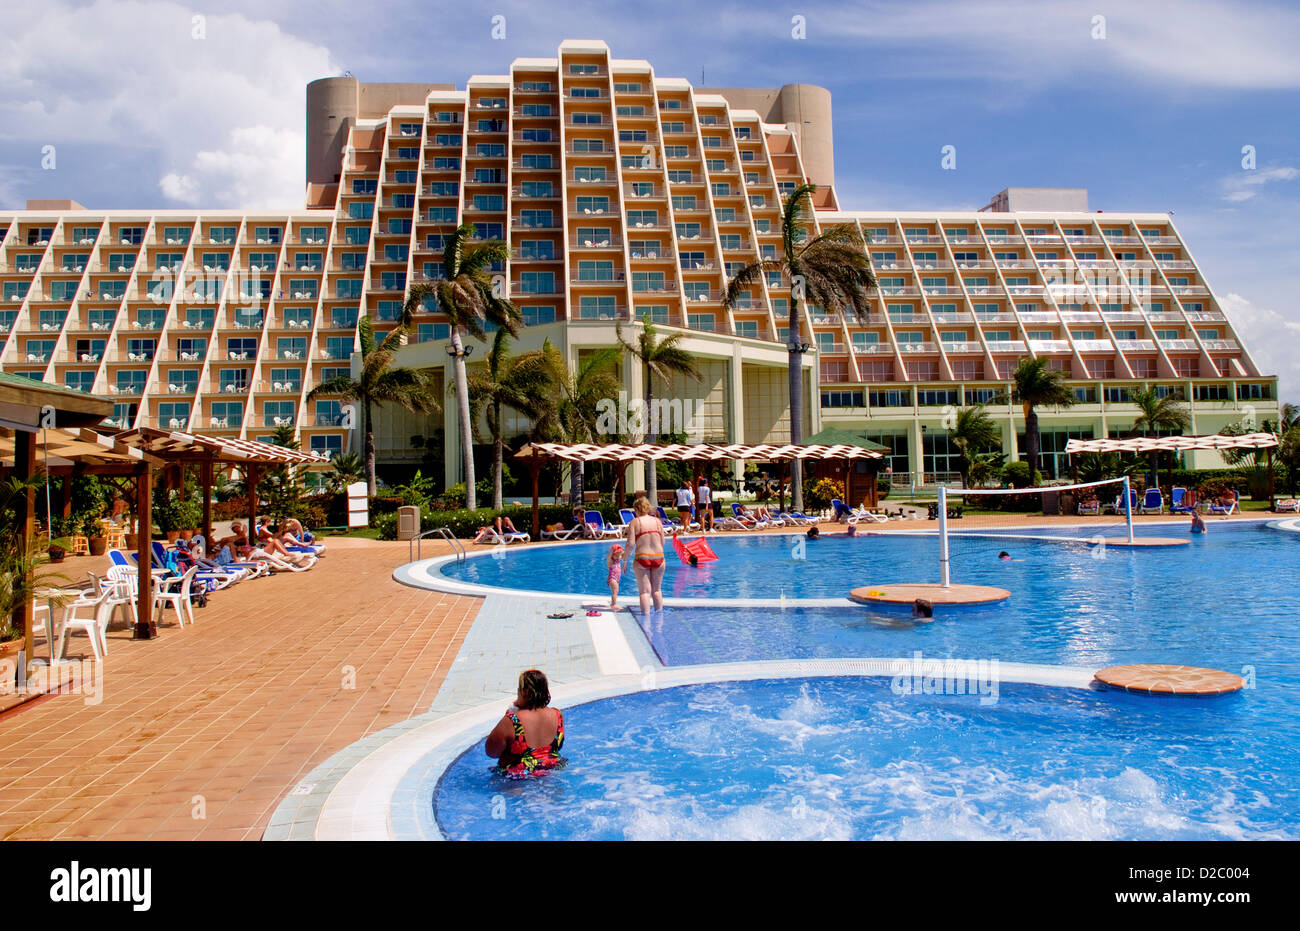 Blau varadero hotel varadero beach cuba